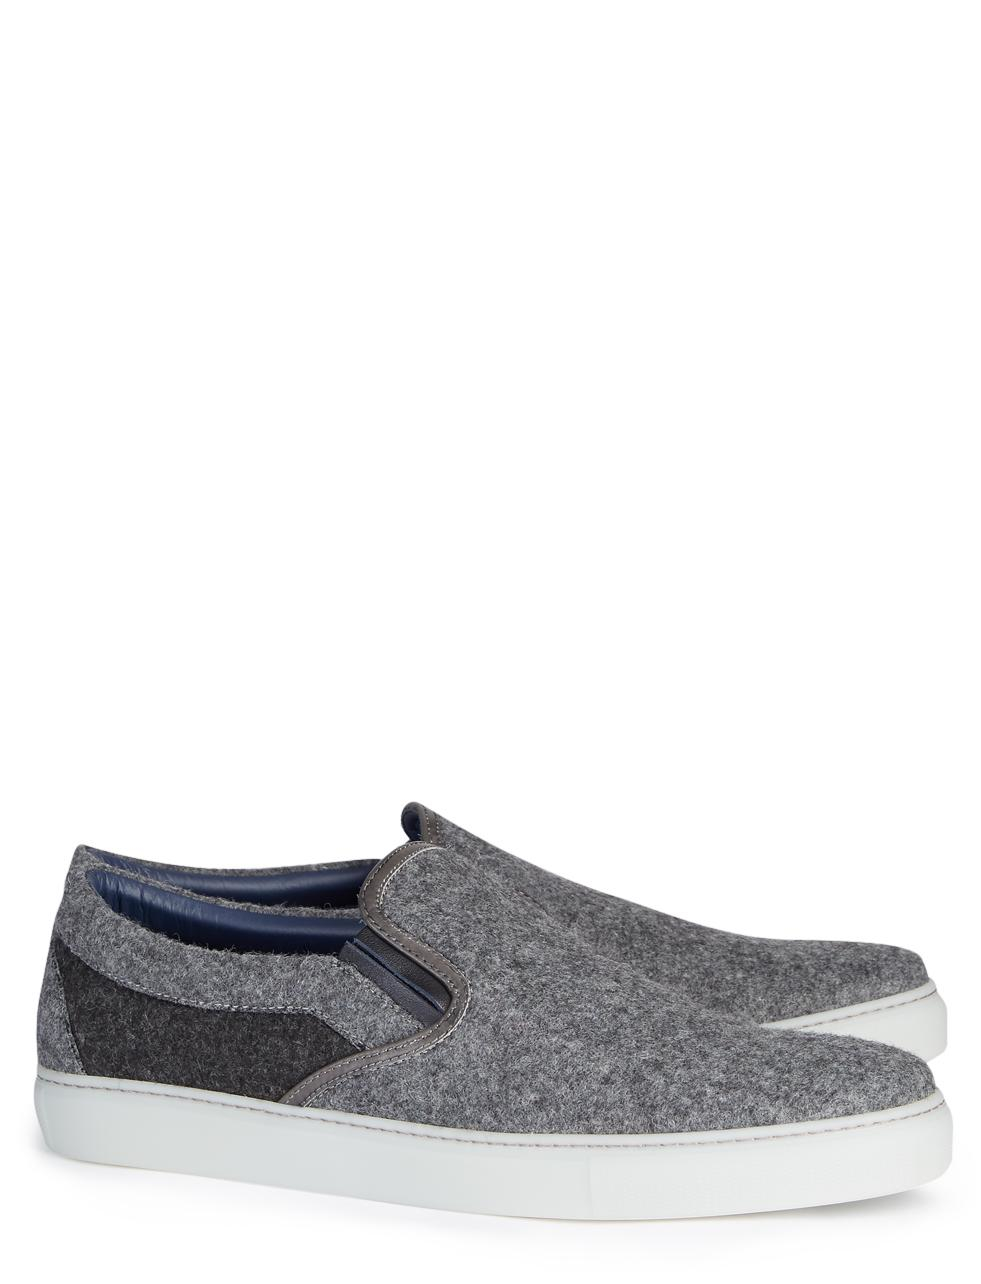 joseph flannel slip on shoe in gray for lyst